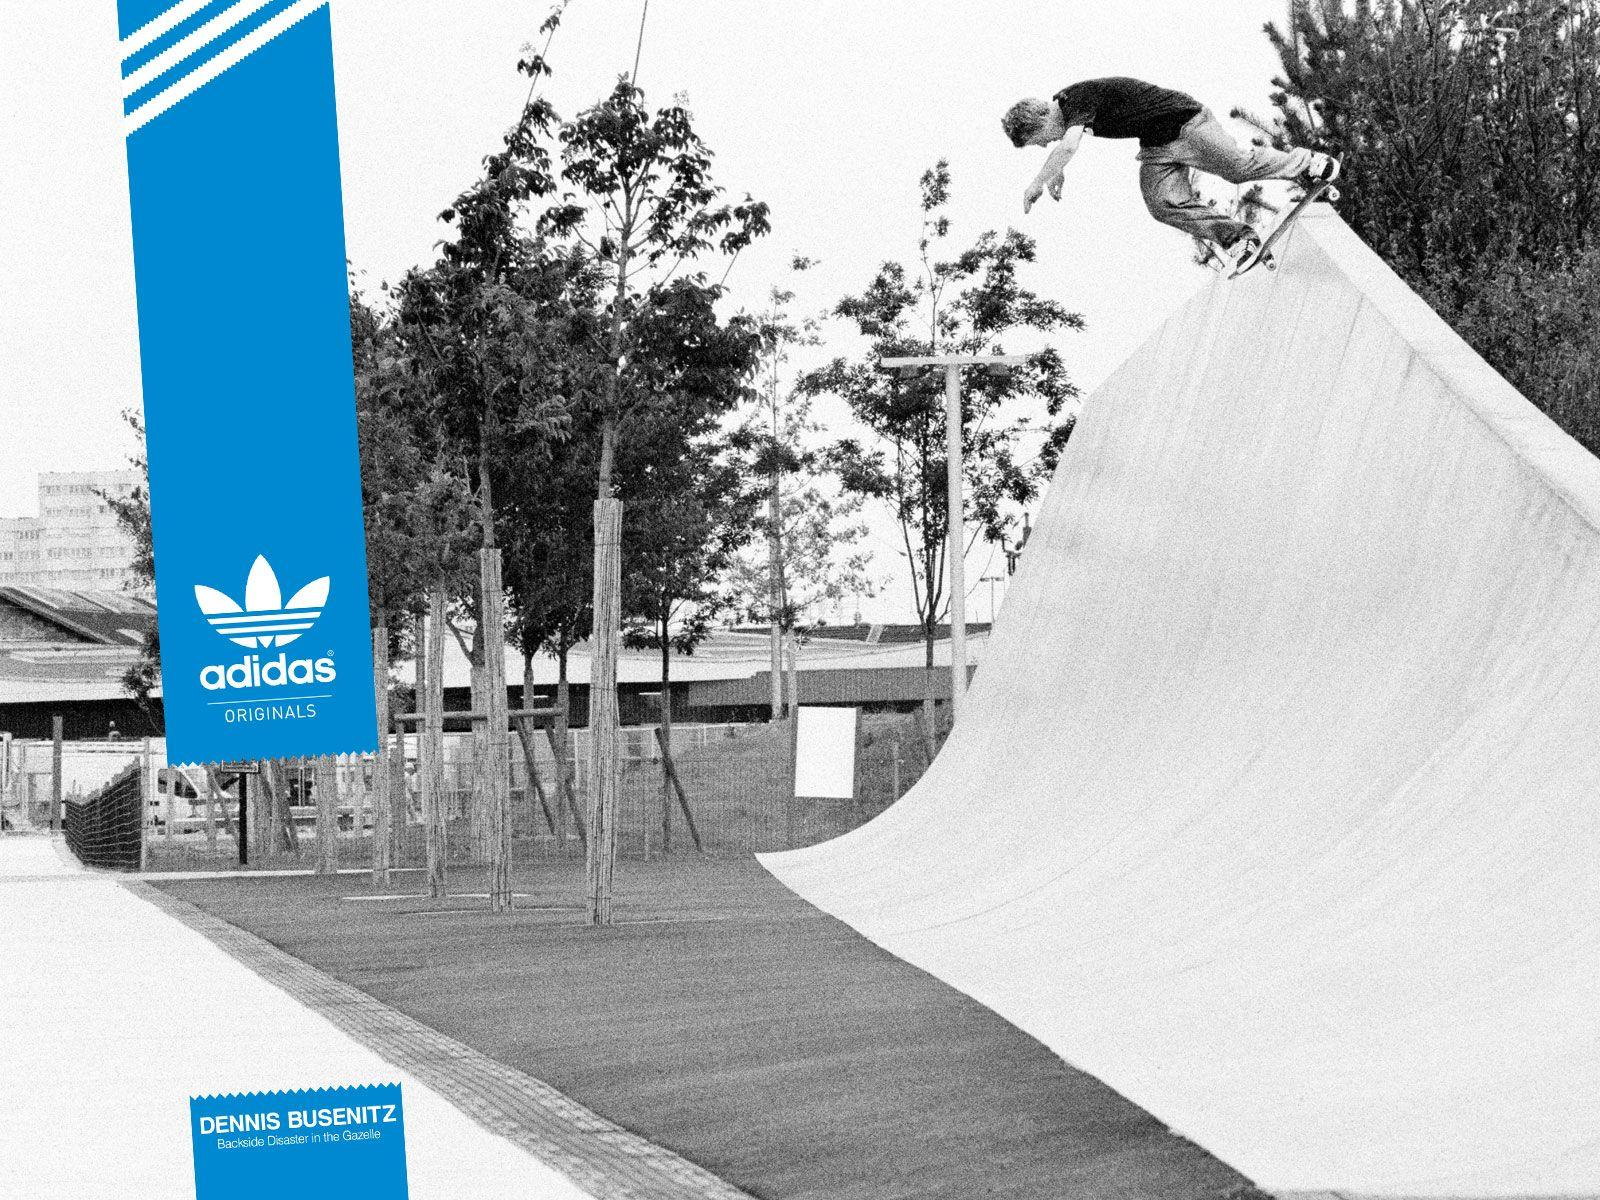 adidas skateboarding wallpapers wallpaper cave